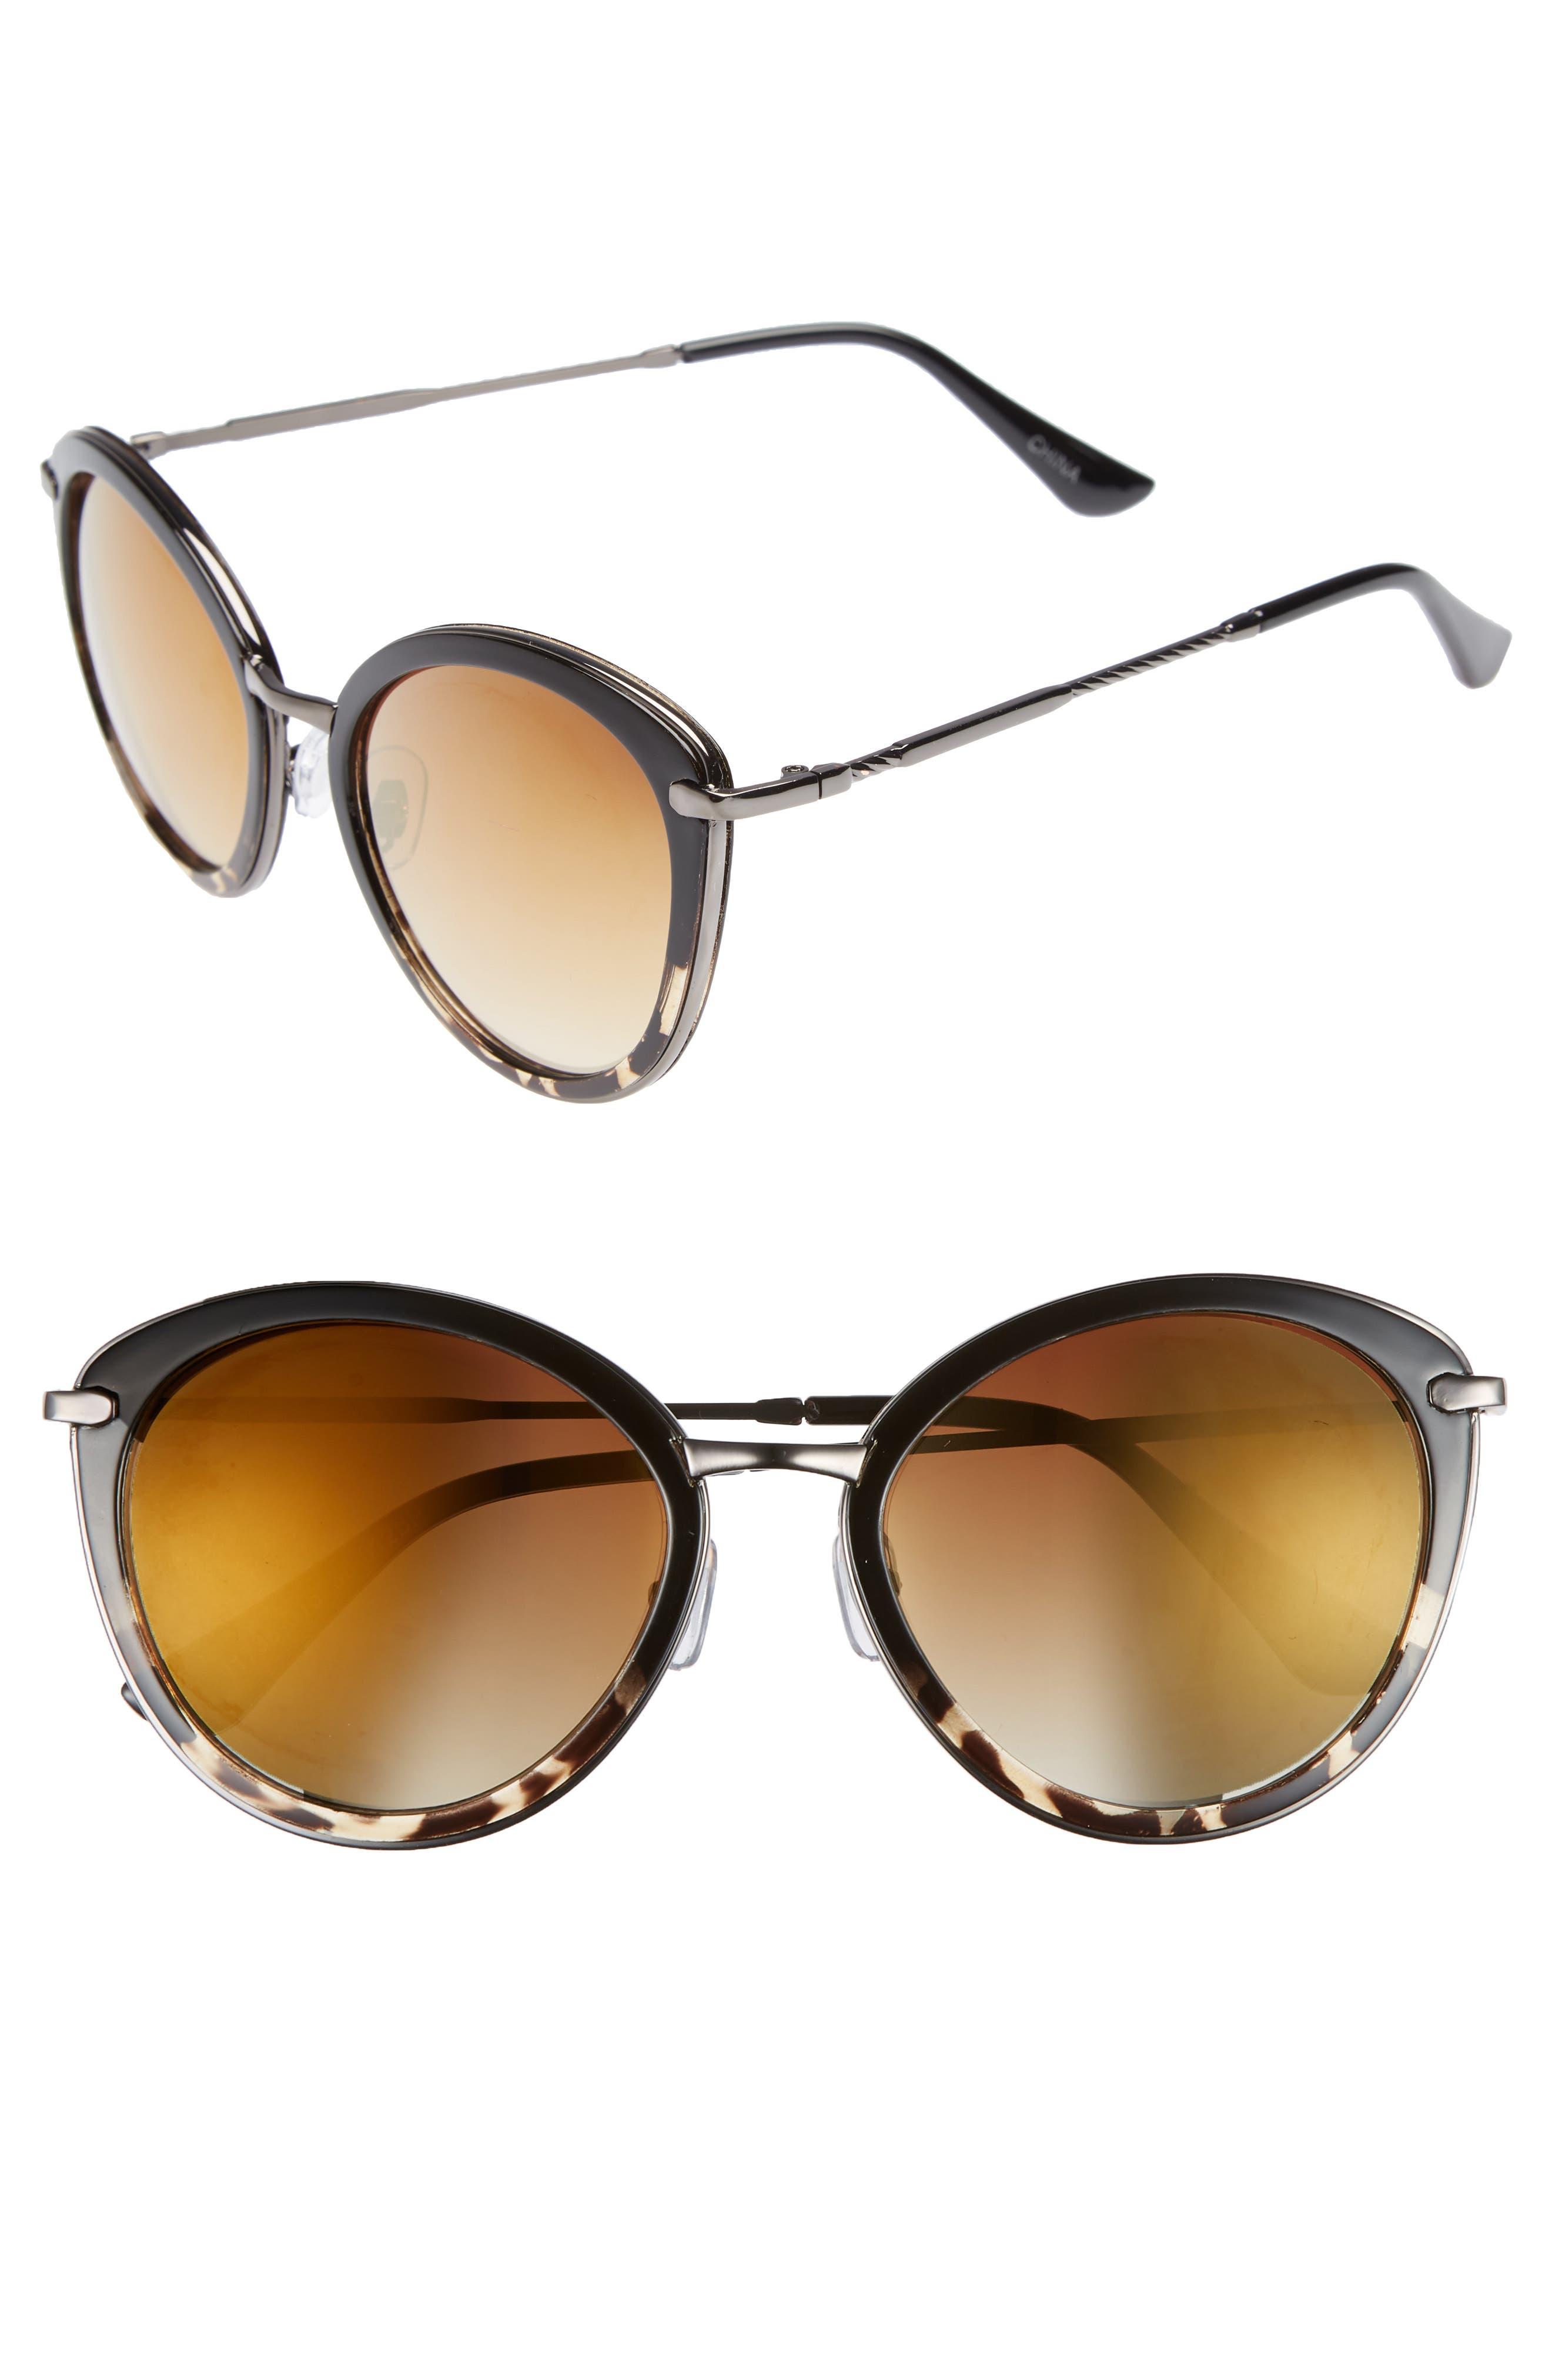 54mm Round Sunglasses,                             Main thumbnail 1, color,                             Black/ Tort